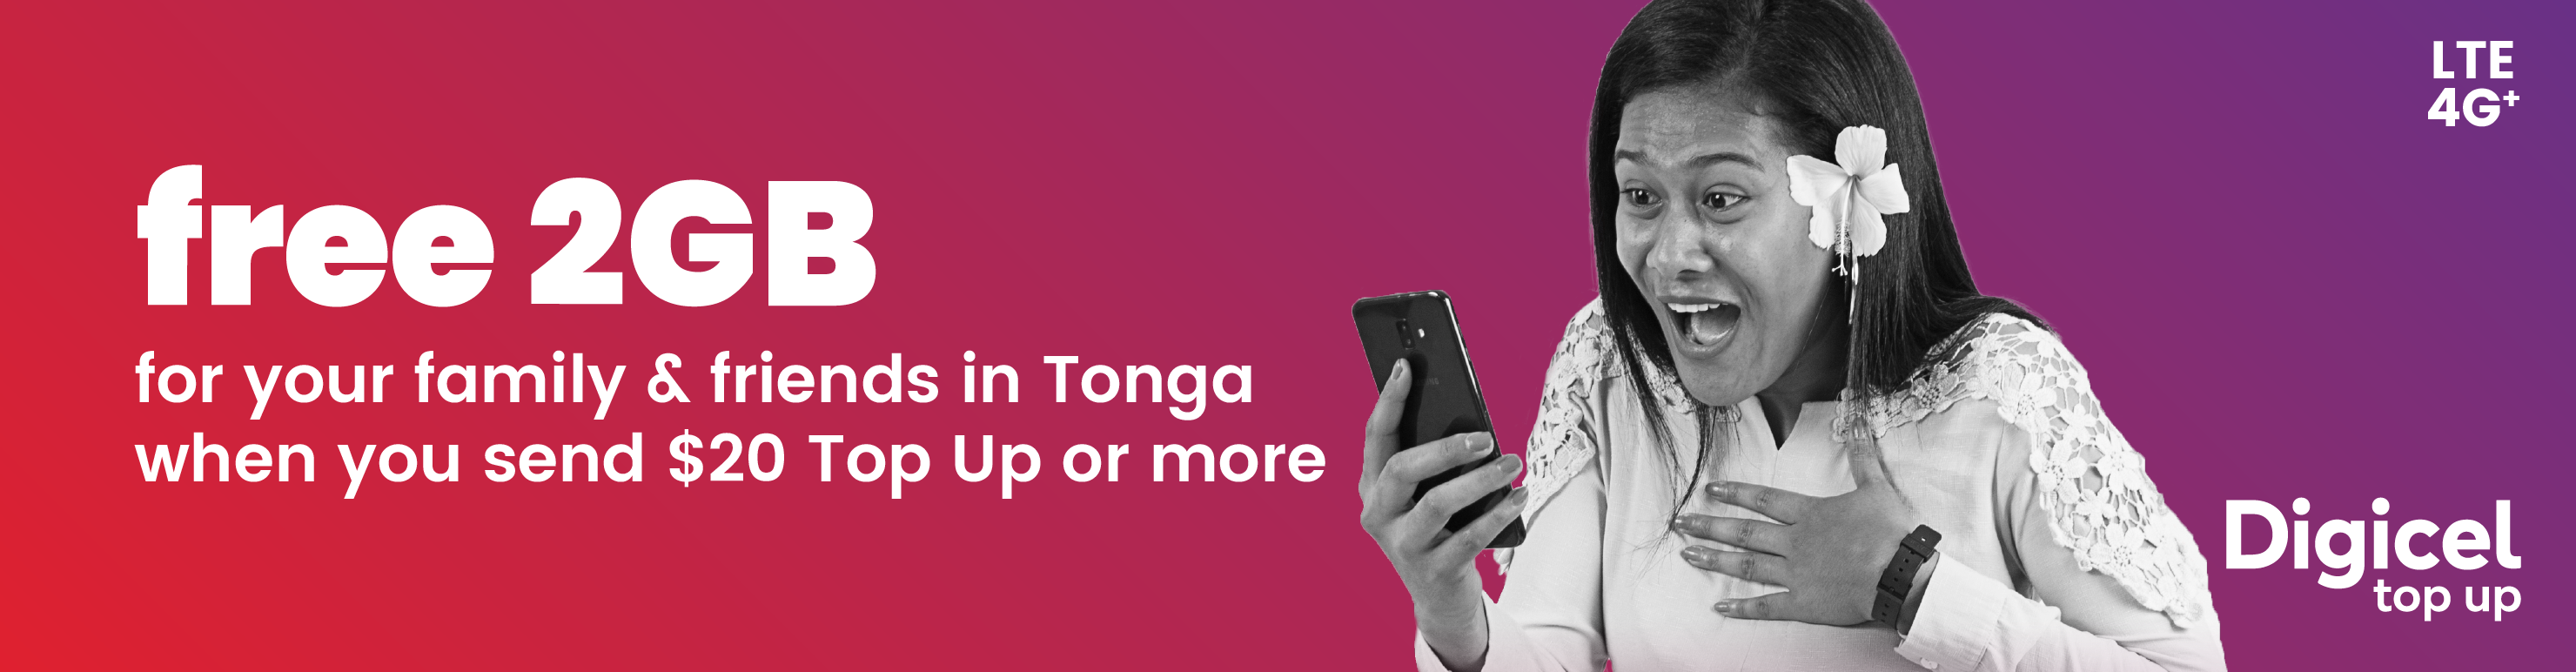 Digicel Tonga